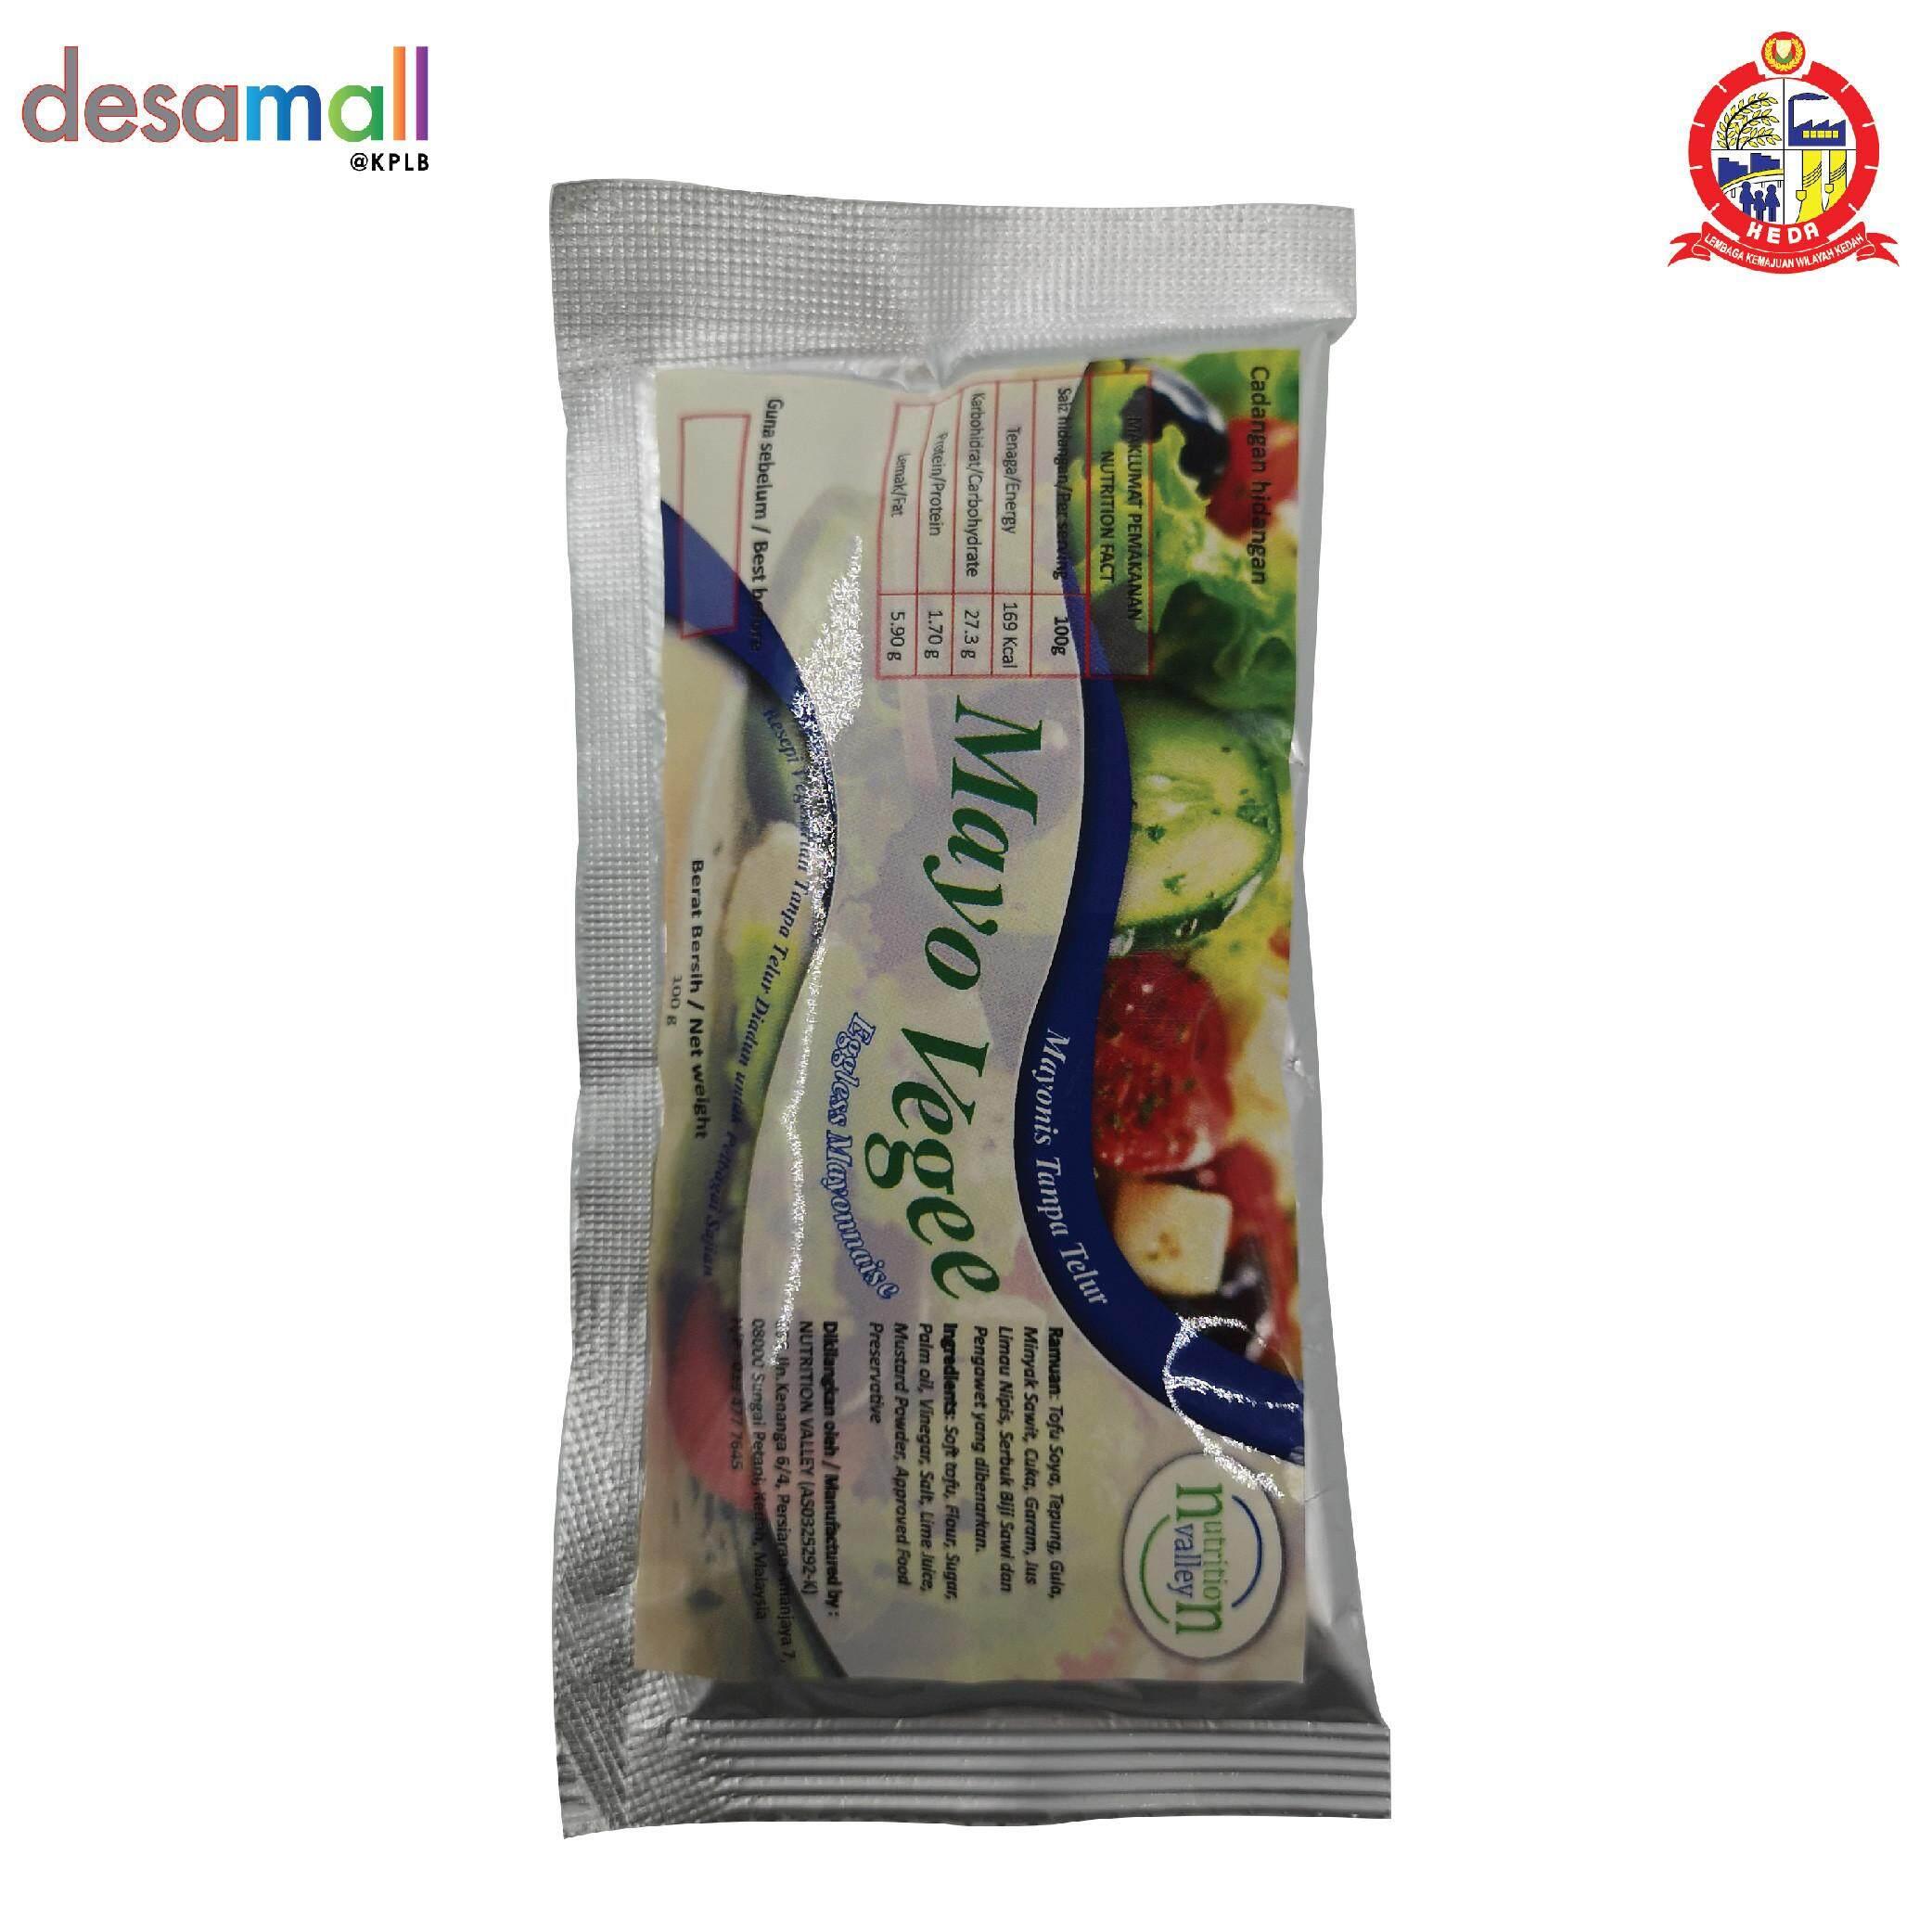 Nutrition Valley Mayo Vegee Mayonis Tanpa Telur (100g)